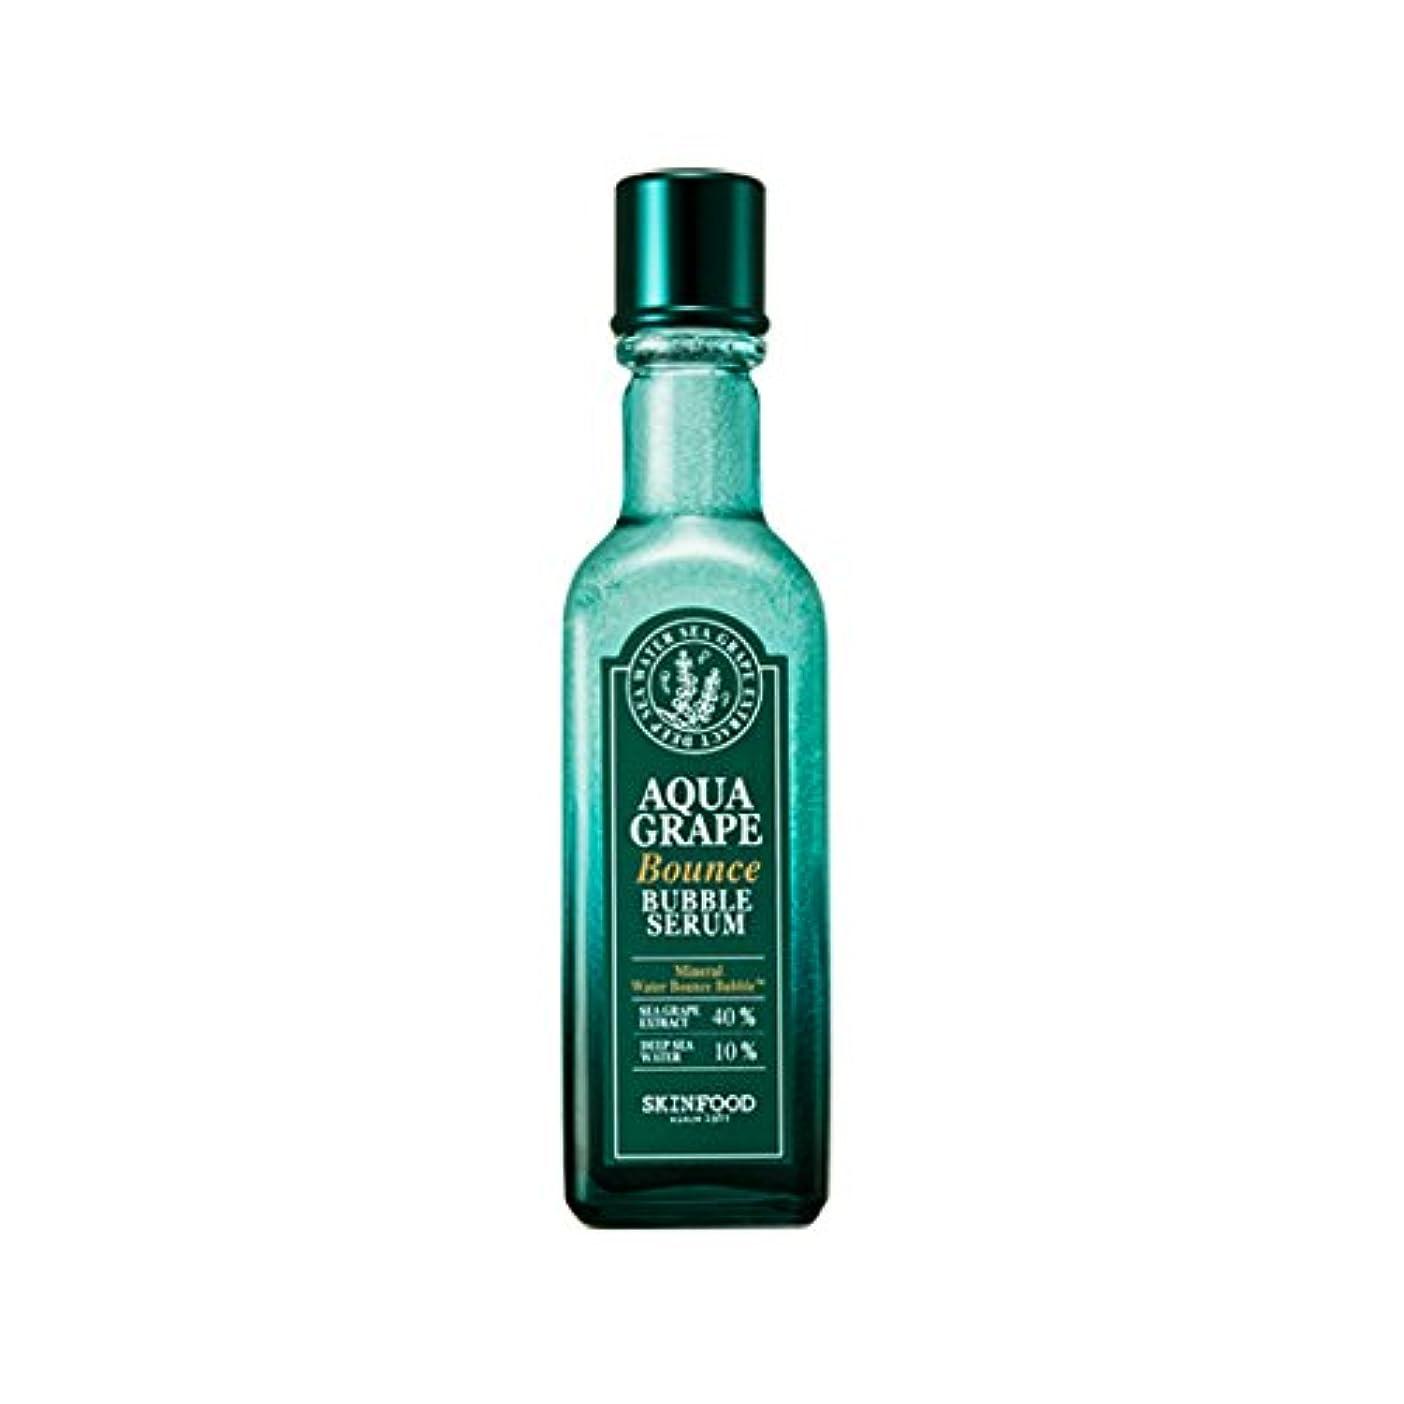 Skinfood アクアグレープバウンスバブル血清/Aqua Grape Bounce Bubble Serum 120ml [並行輸入品]